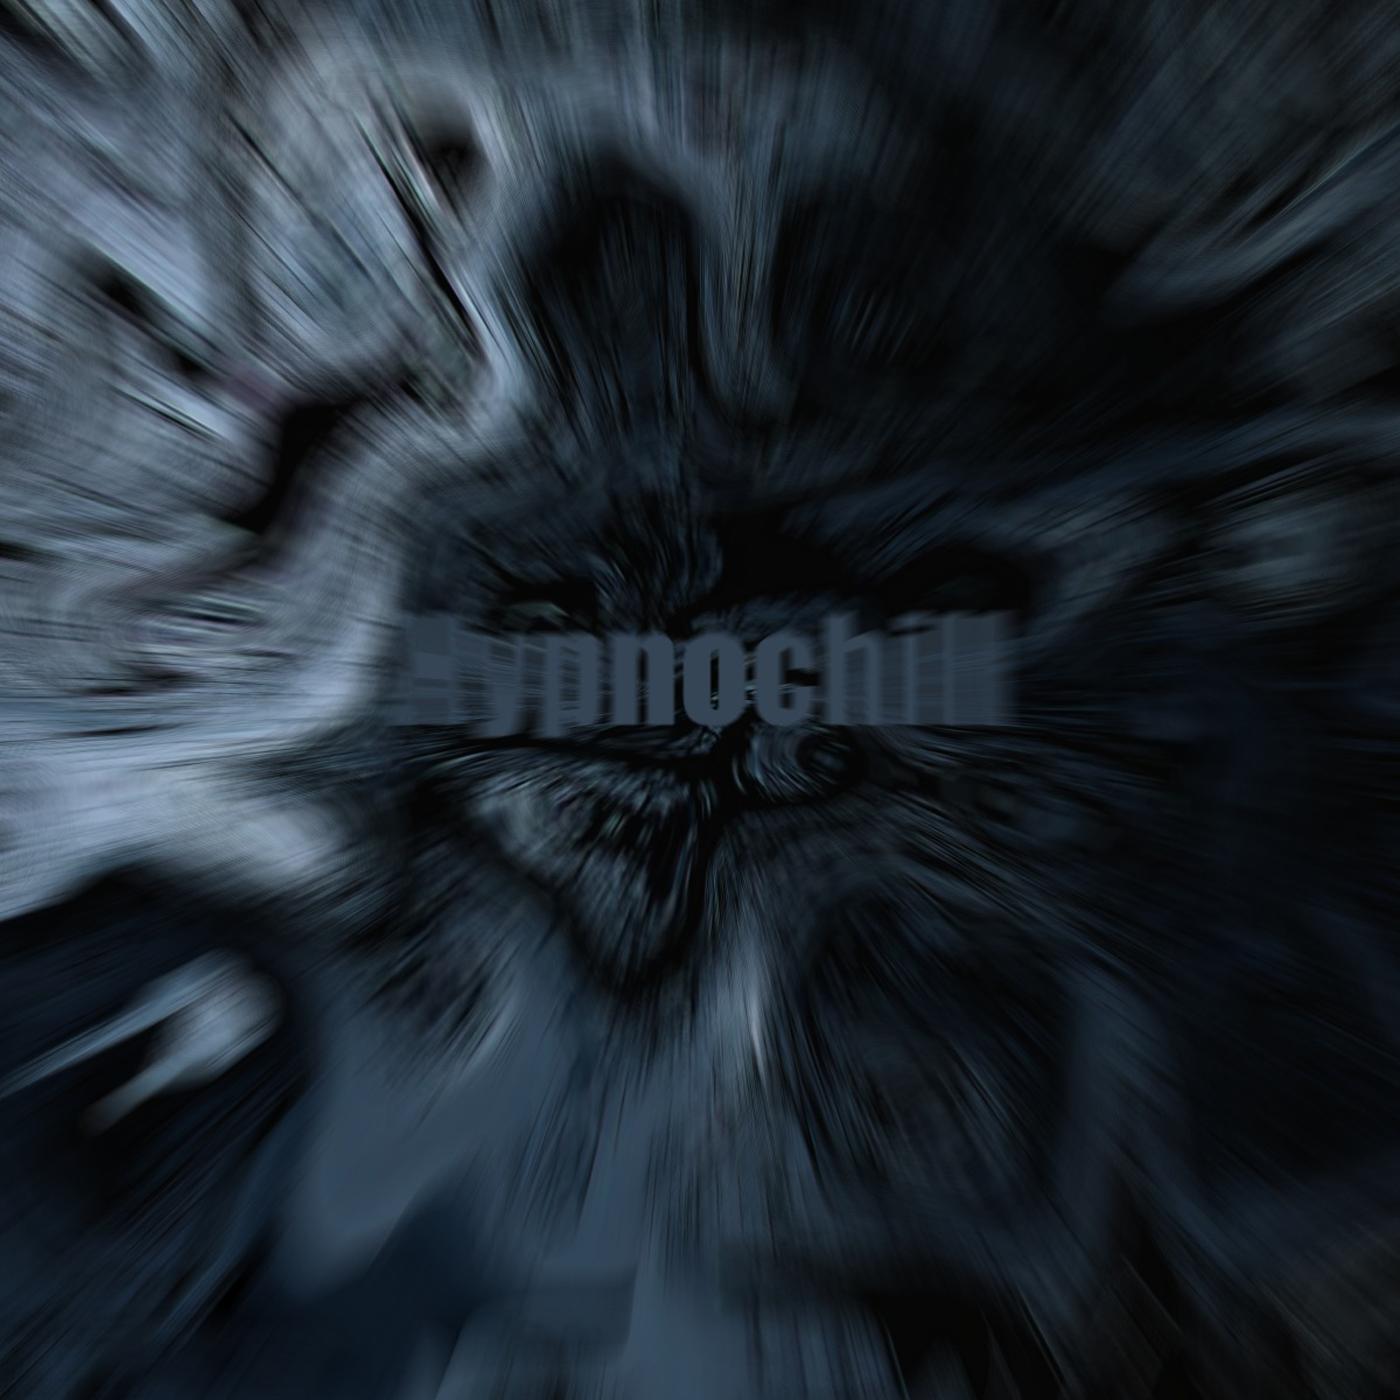 Silence - Hypnochill